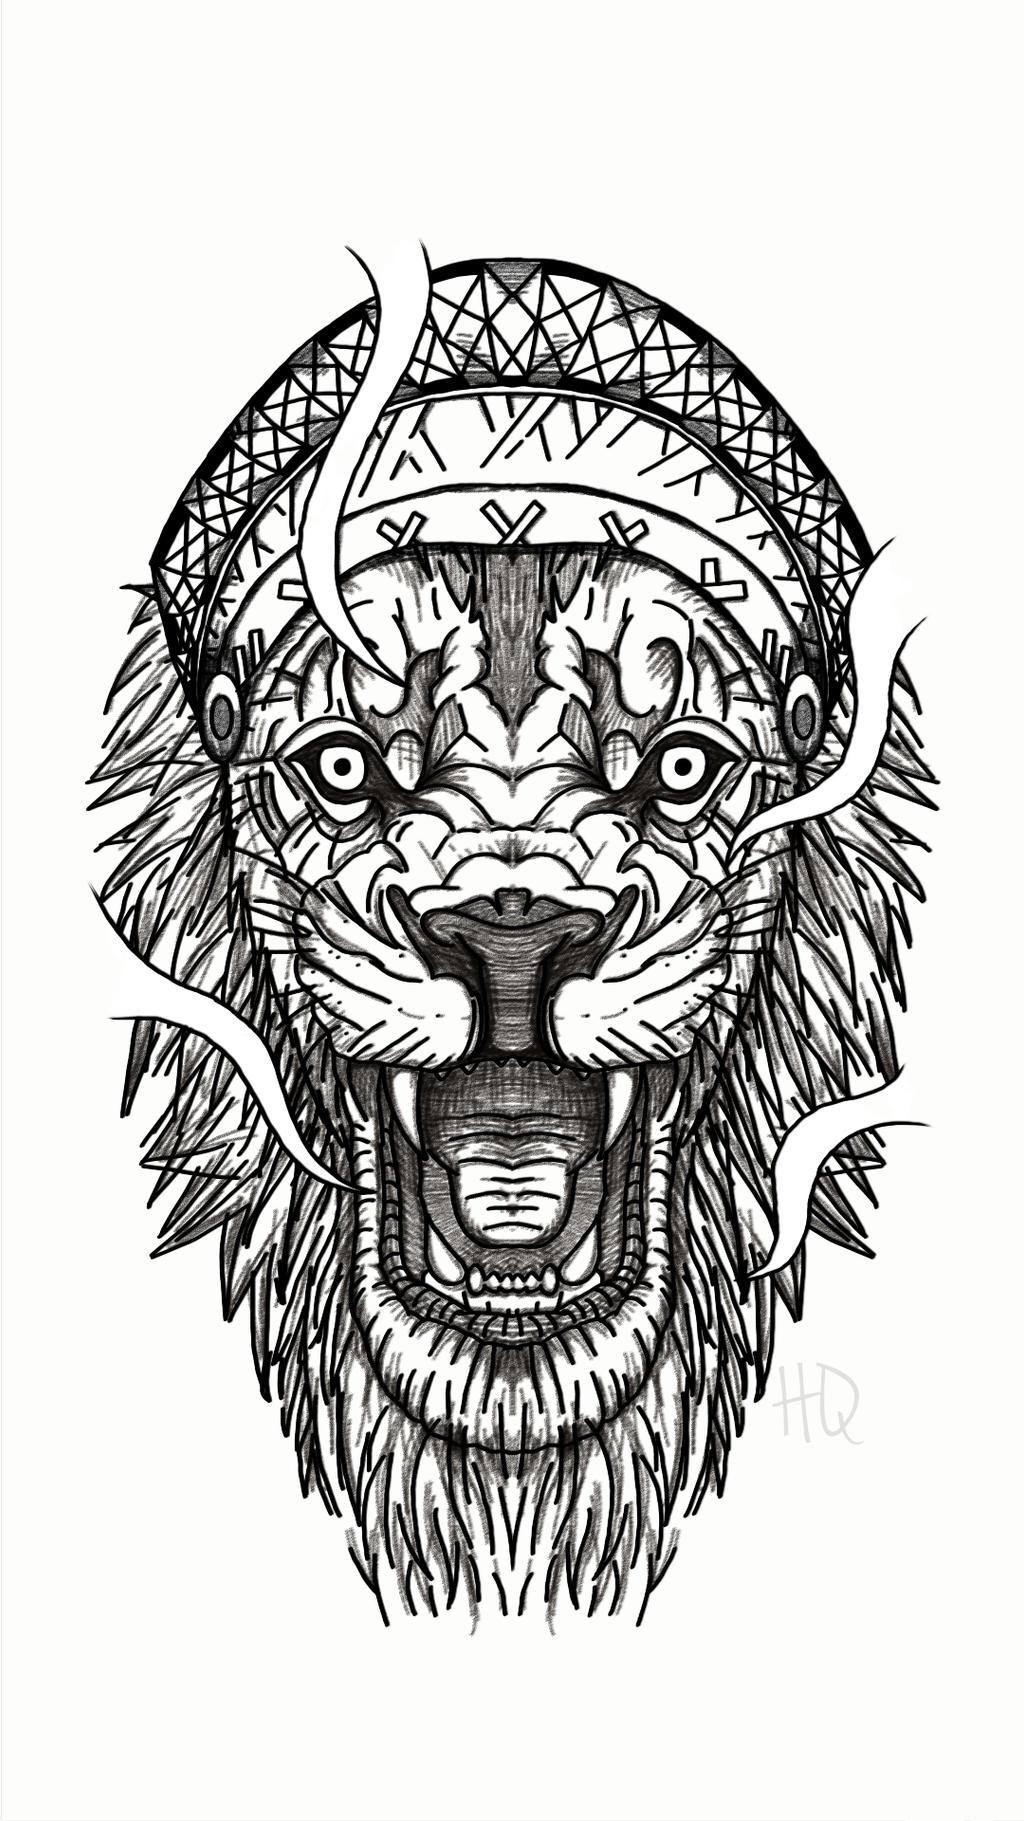 Lion Head Tattoo By H1ghqu4l1ty On Deviantart